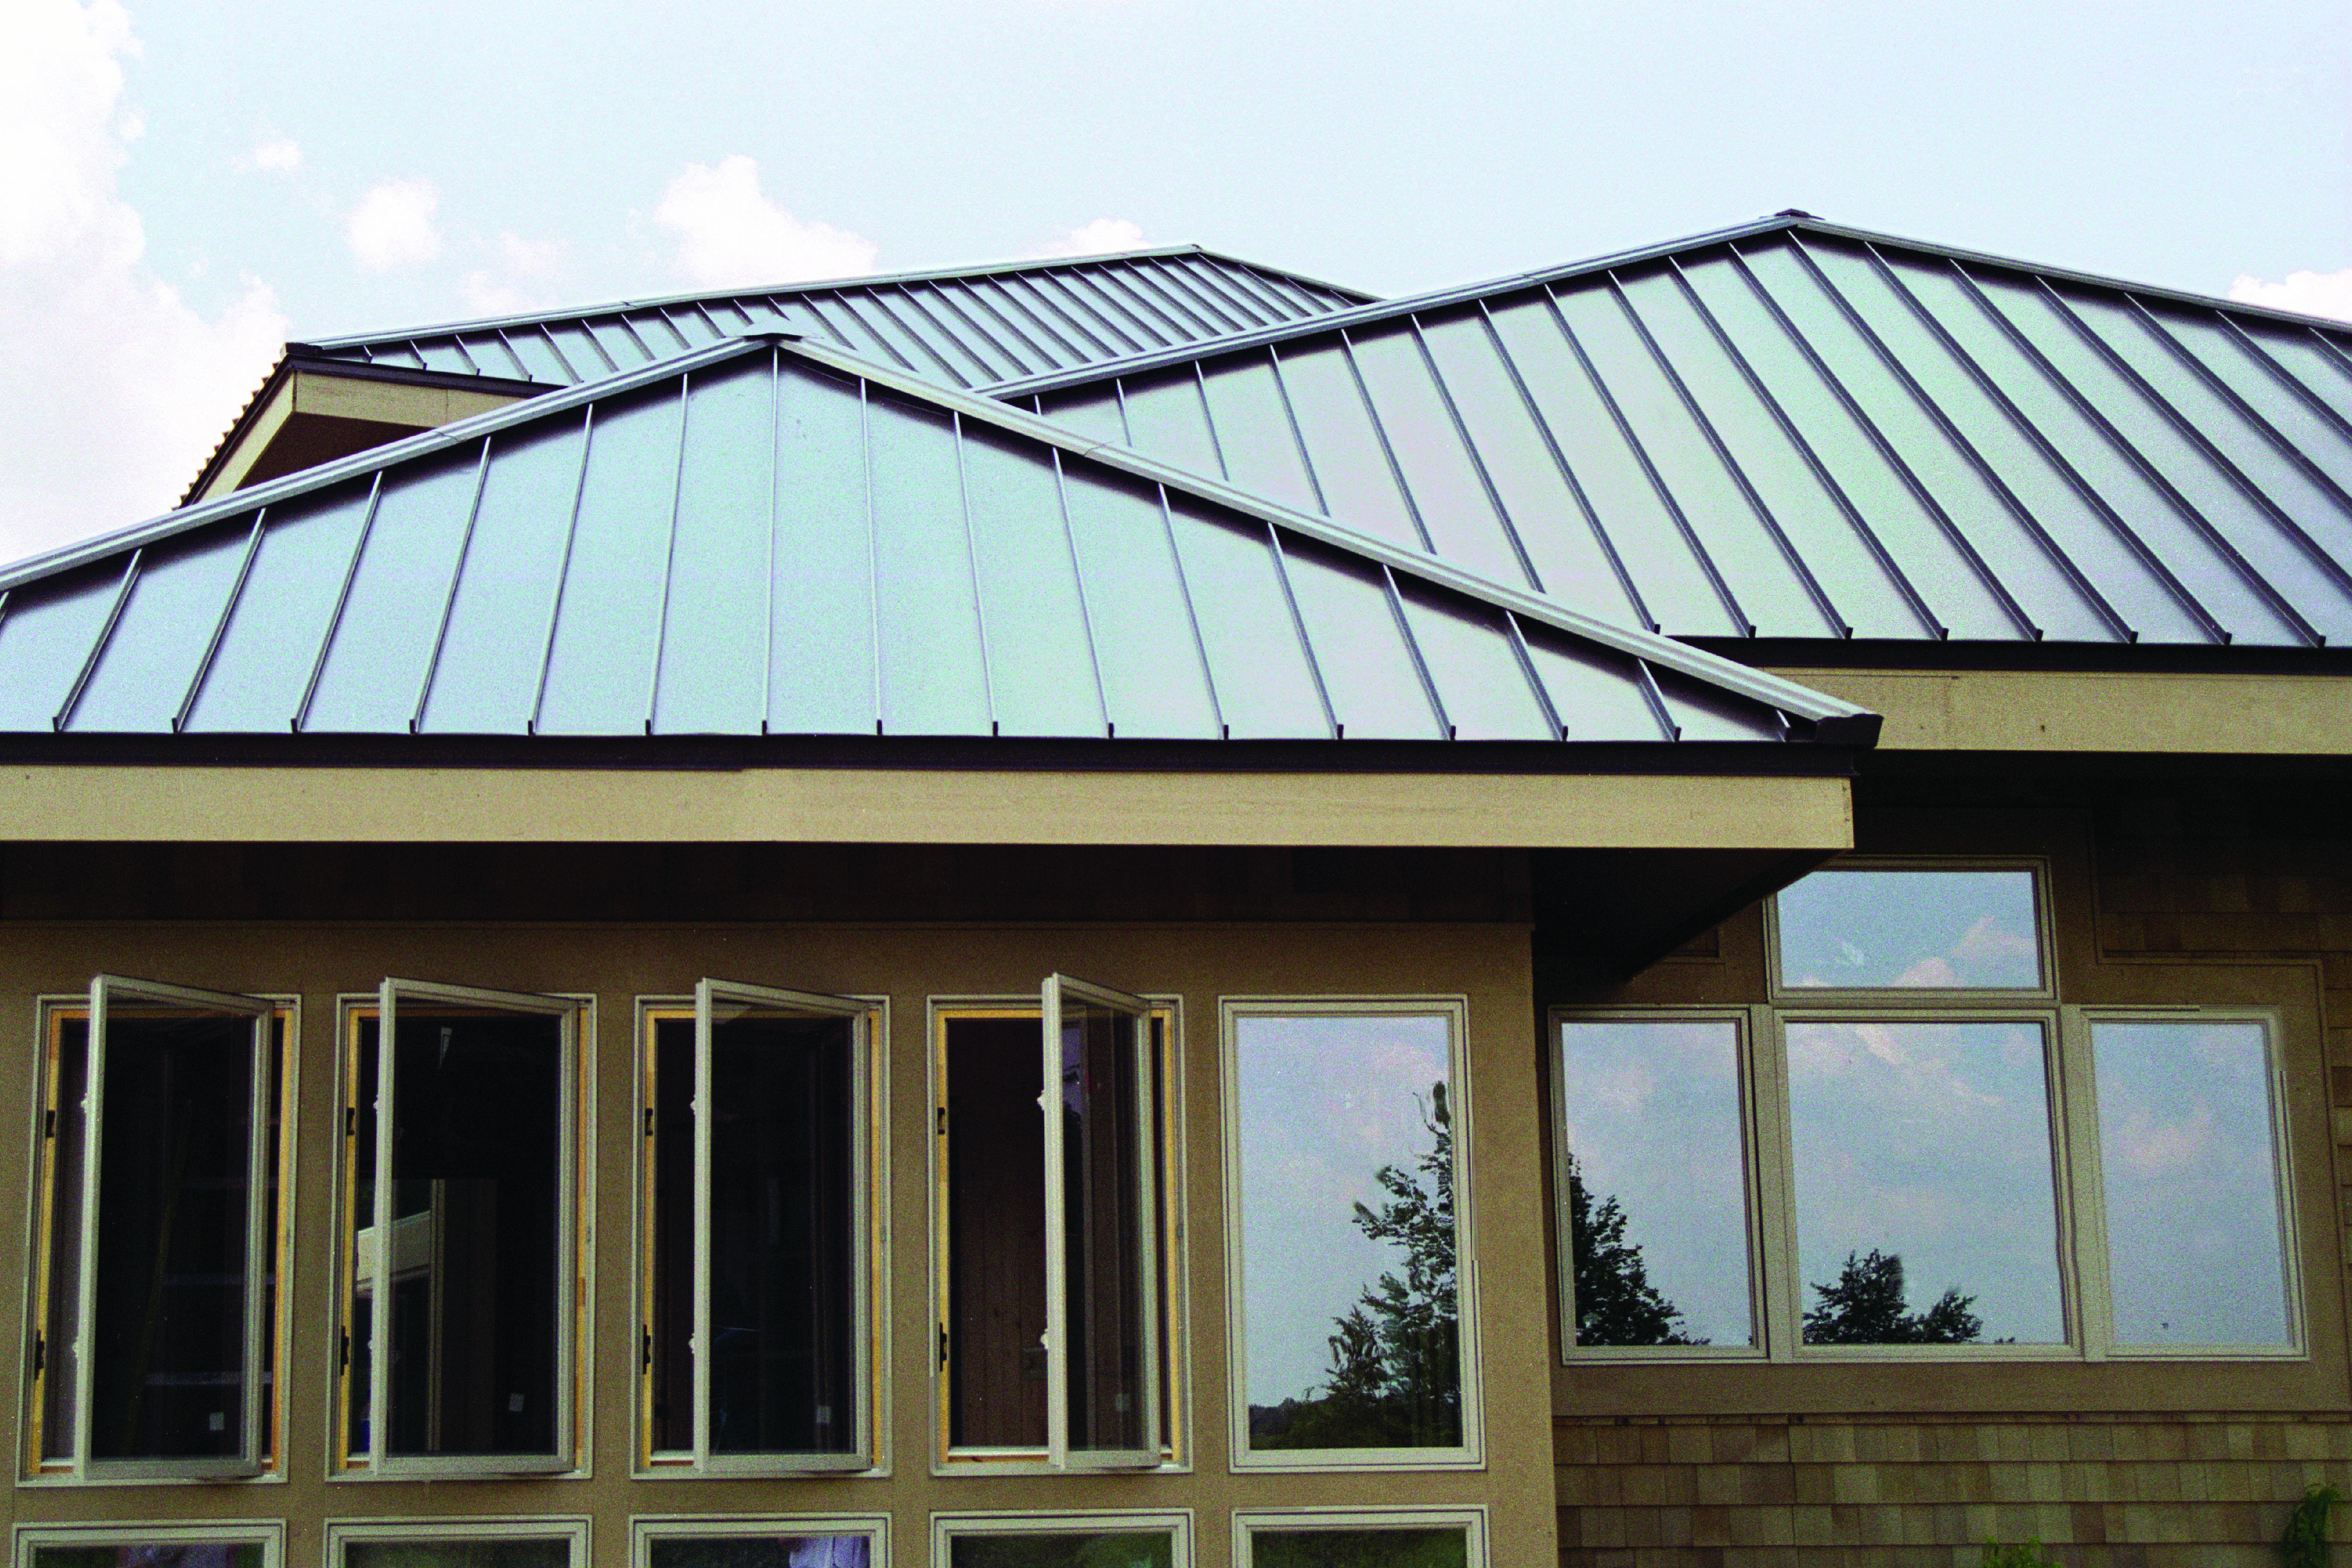 Metal Standing Seam Can Look Good Too Residential Metal Roofing Standing Seam Metal Roof Standing Seam